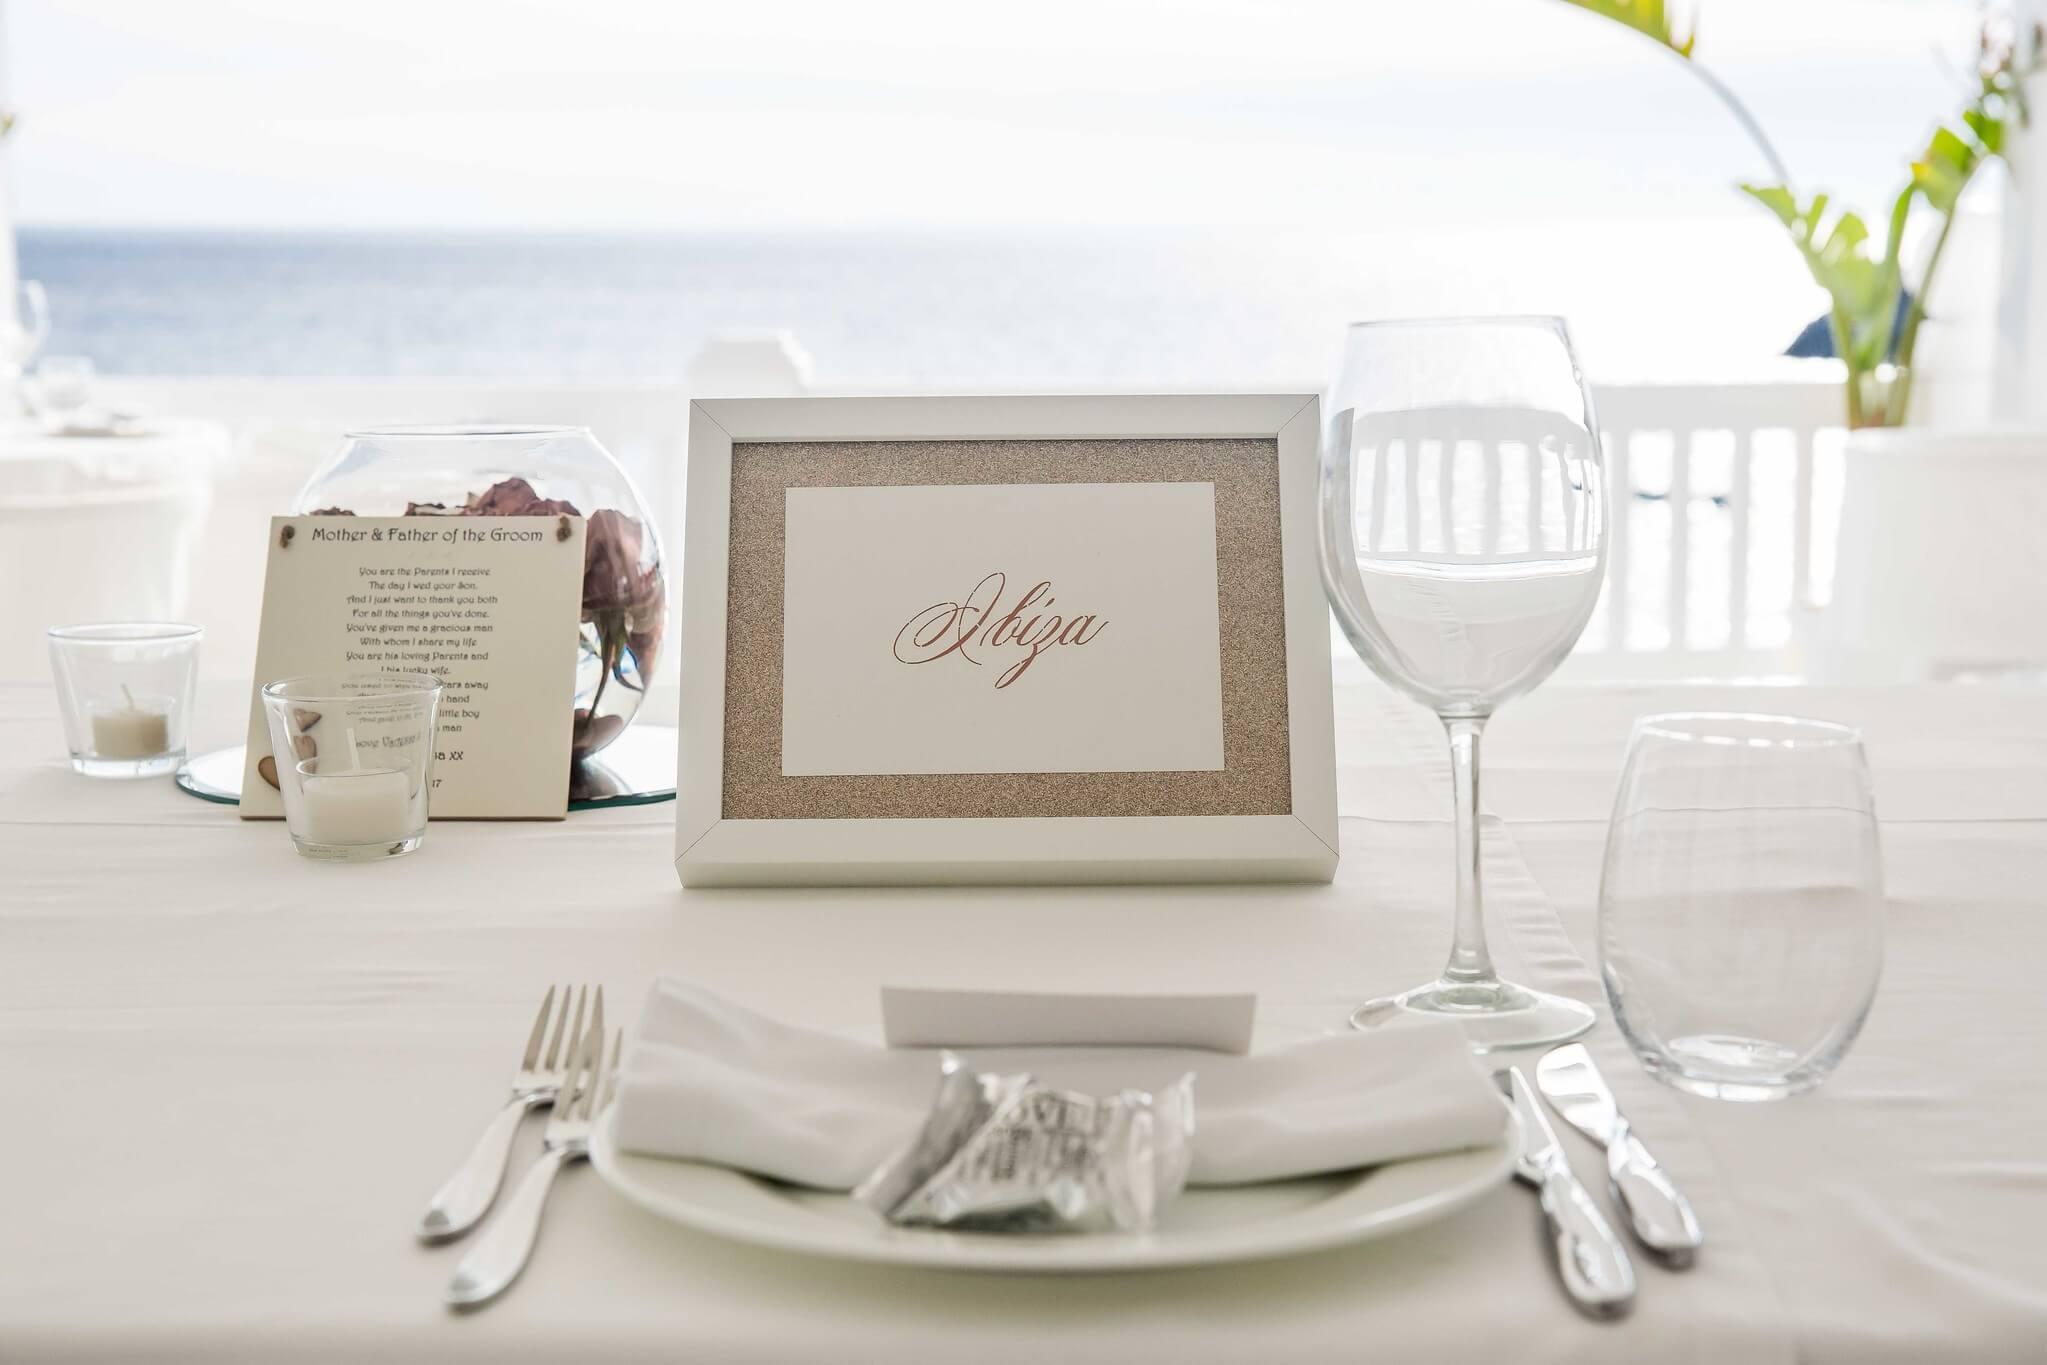 https://www.white-ibiza.com/wp-content/uploads/2020/03/ibiza-wedding-venues-cotton-beach-2020-07.jpg